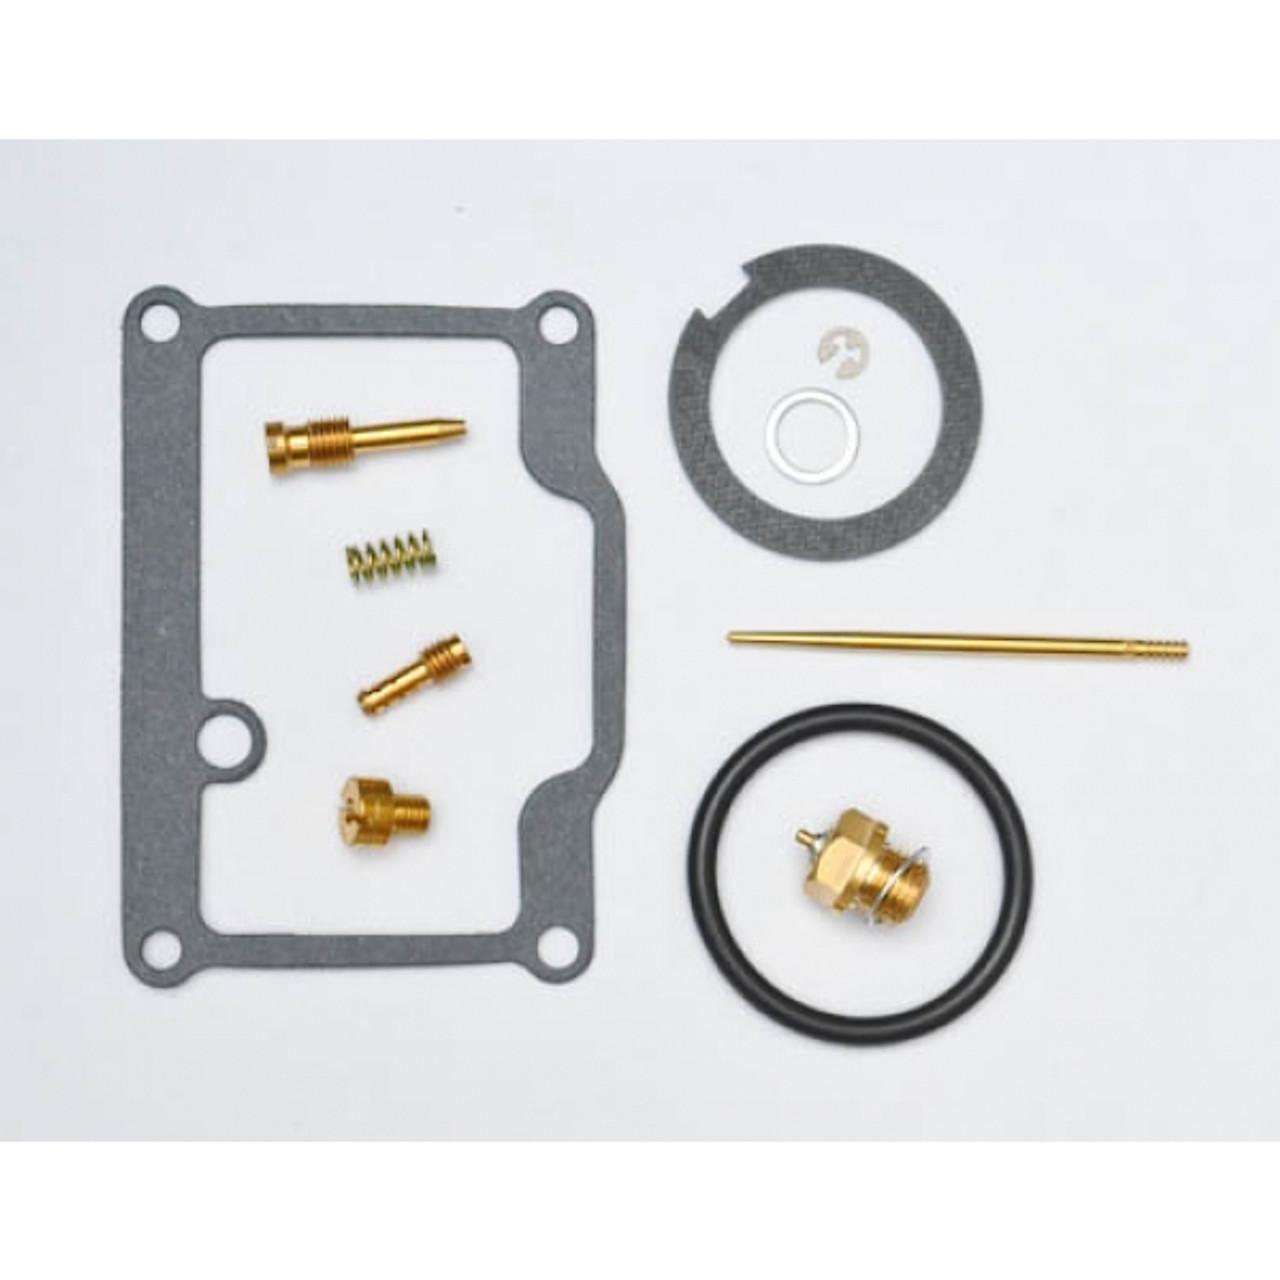 Suzuki Carb Repair Kit GT250 (73-79)